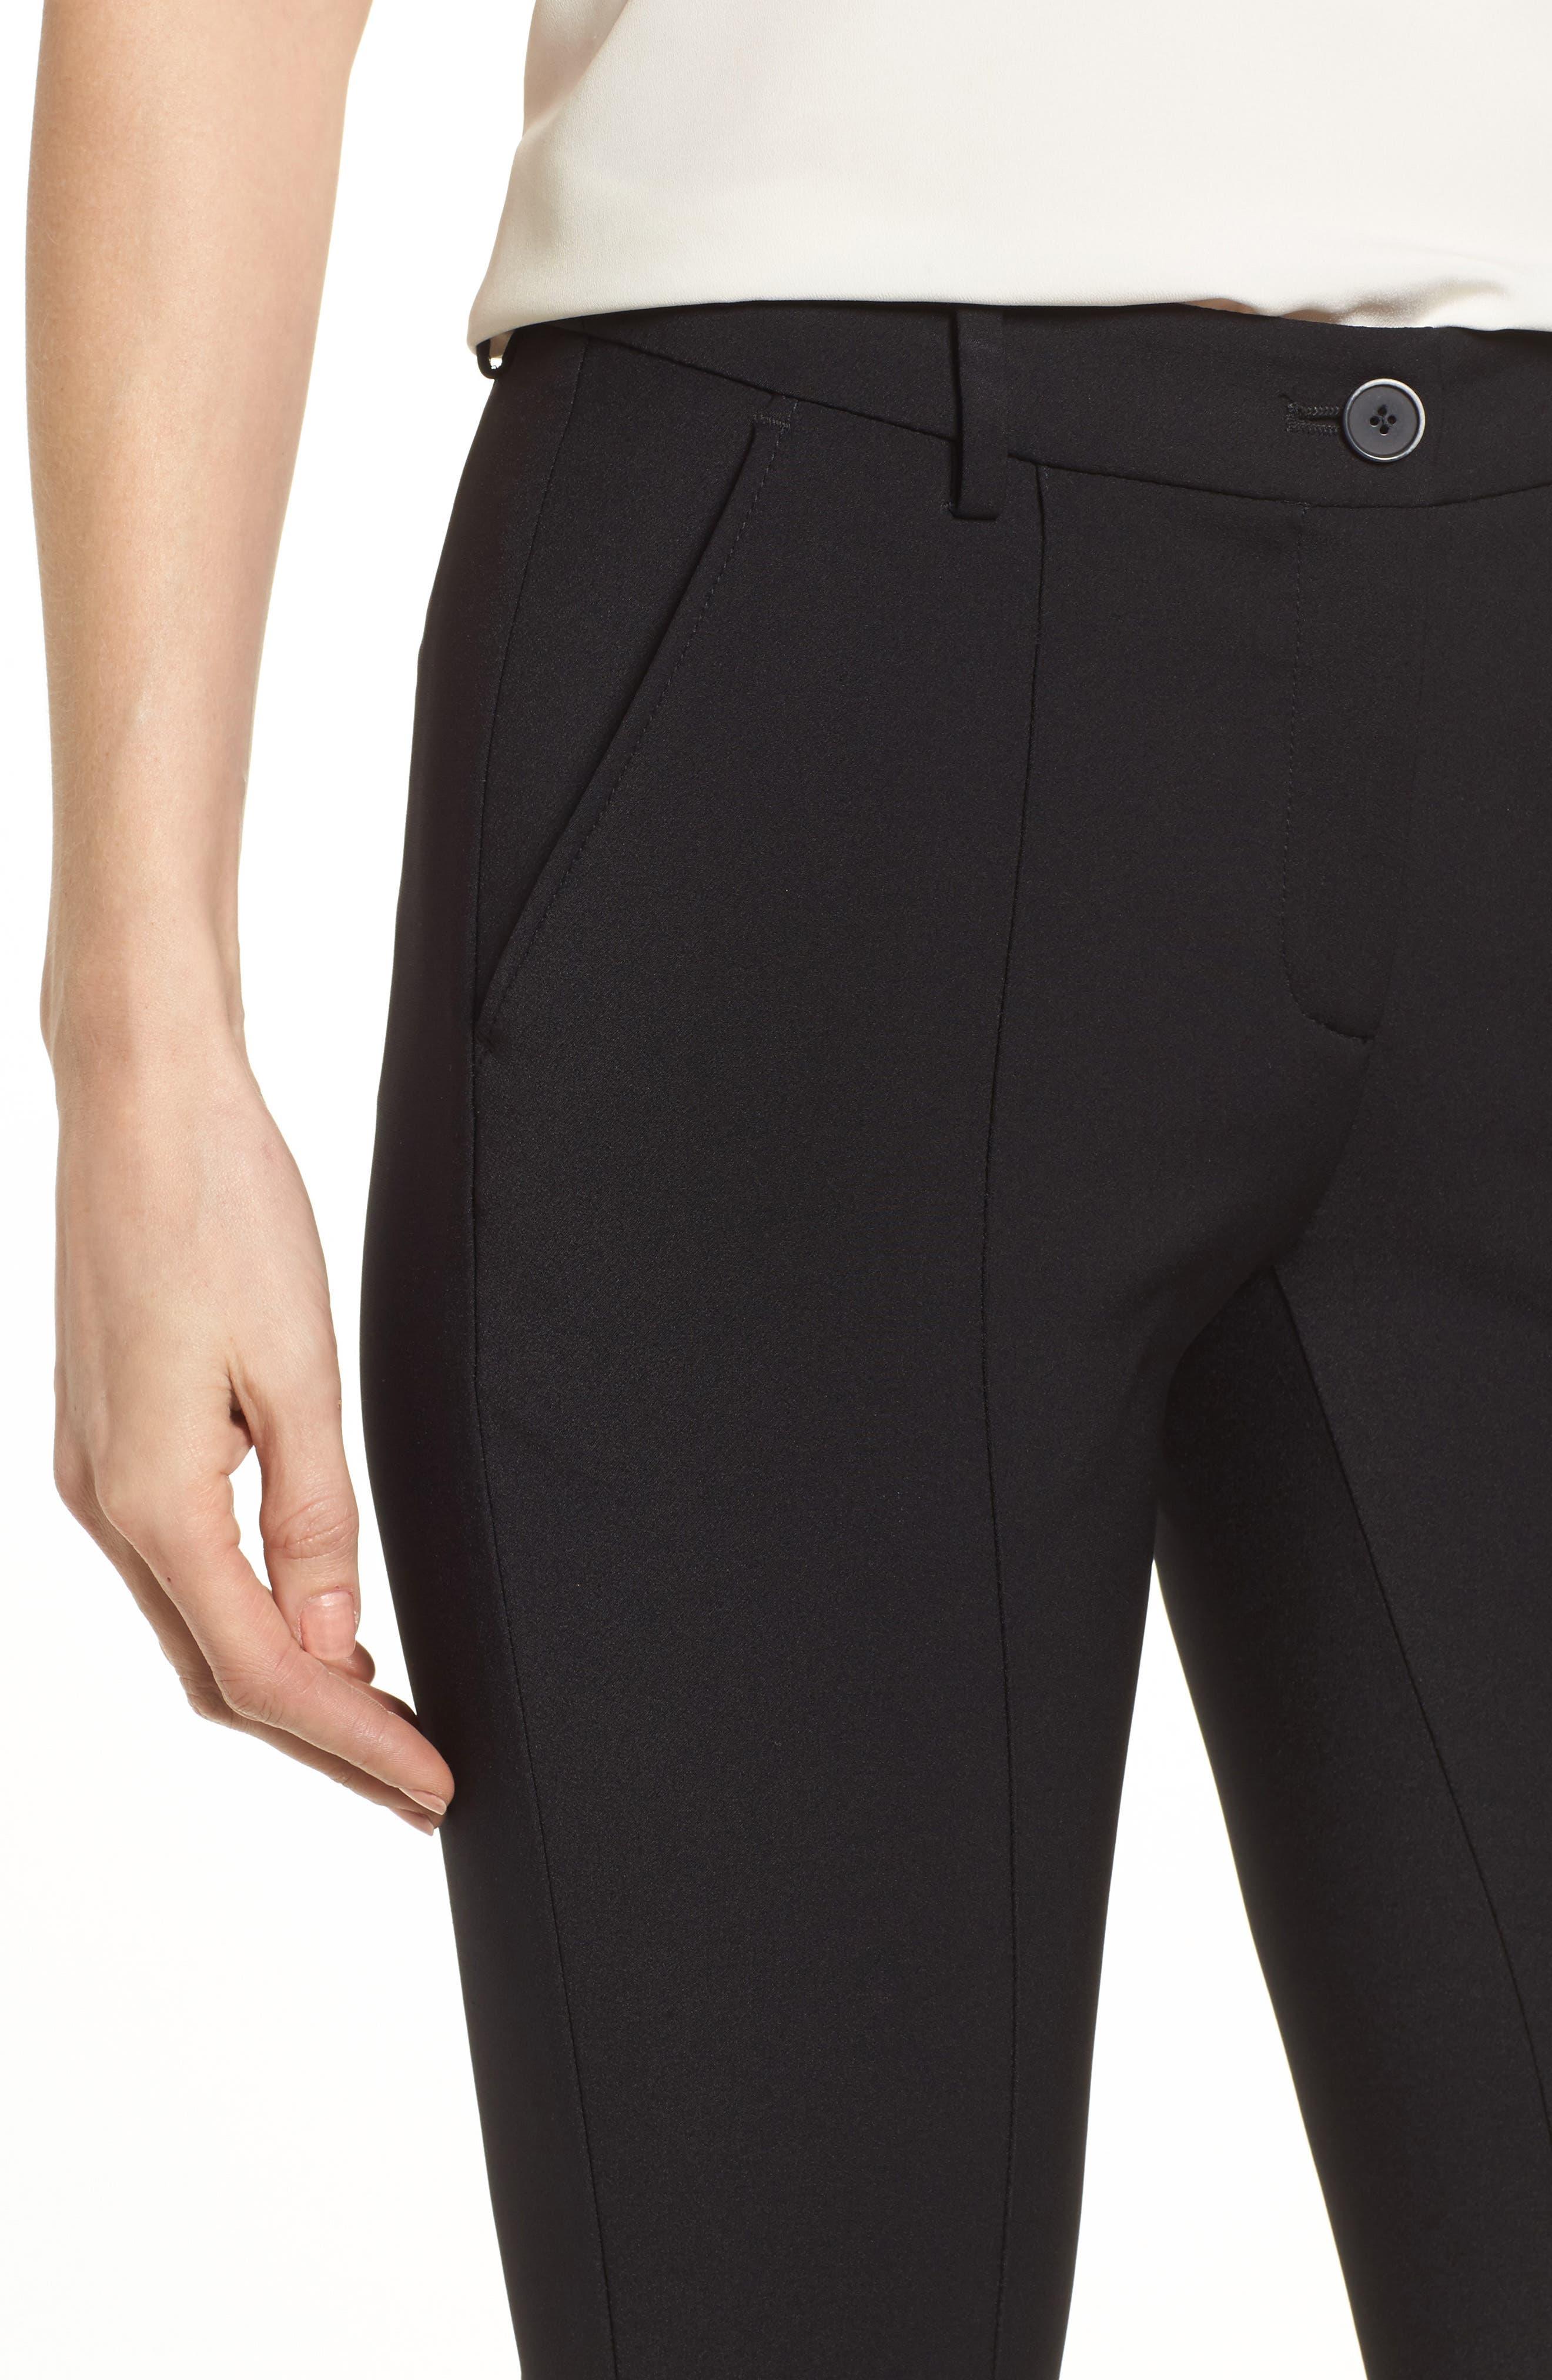 Maron Straight Leg Seamed Pants,                             Alternate thumbnail 4, color,                             Black